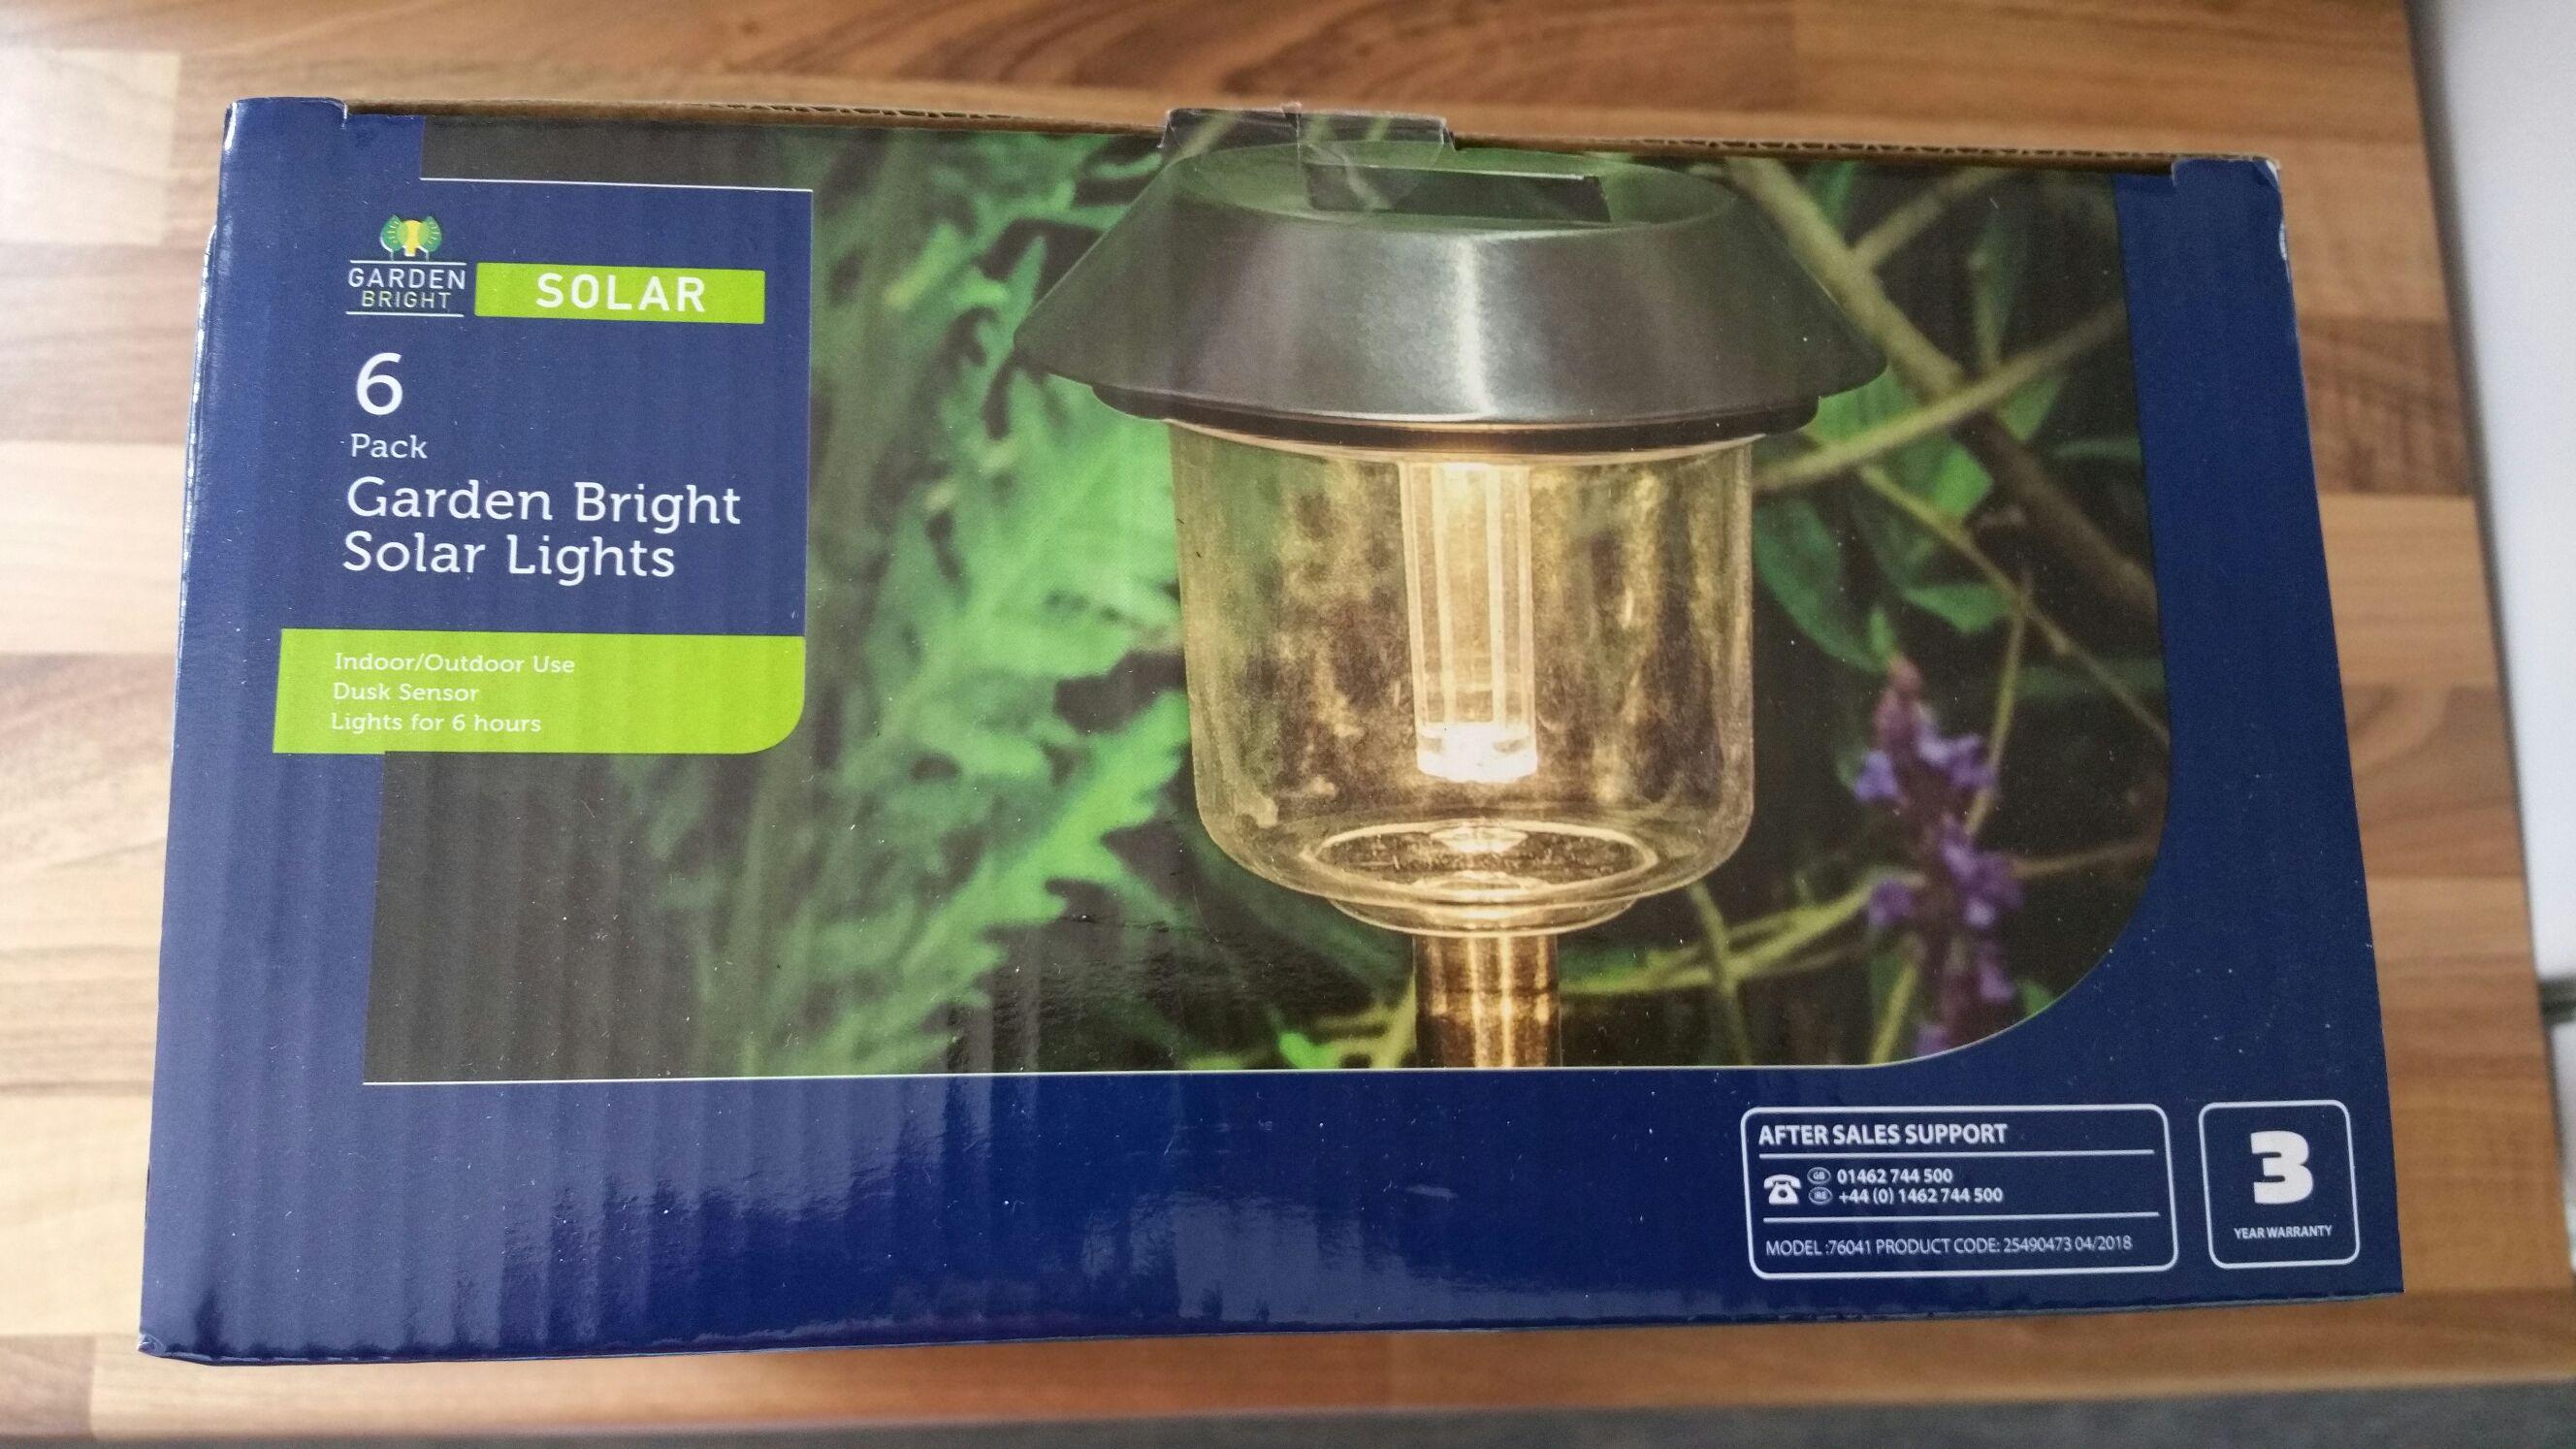 6 x Garden Bright Solar Lights £4.99 @ Aldi